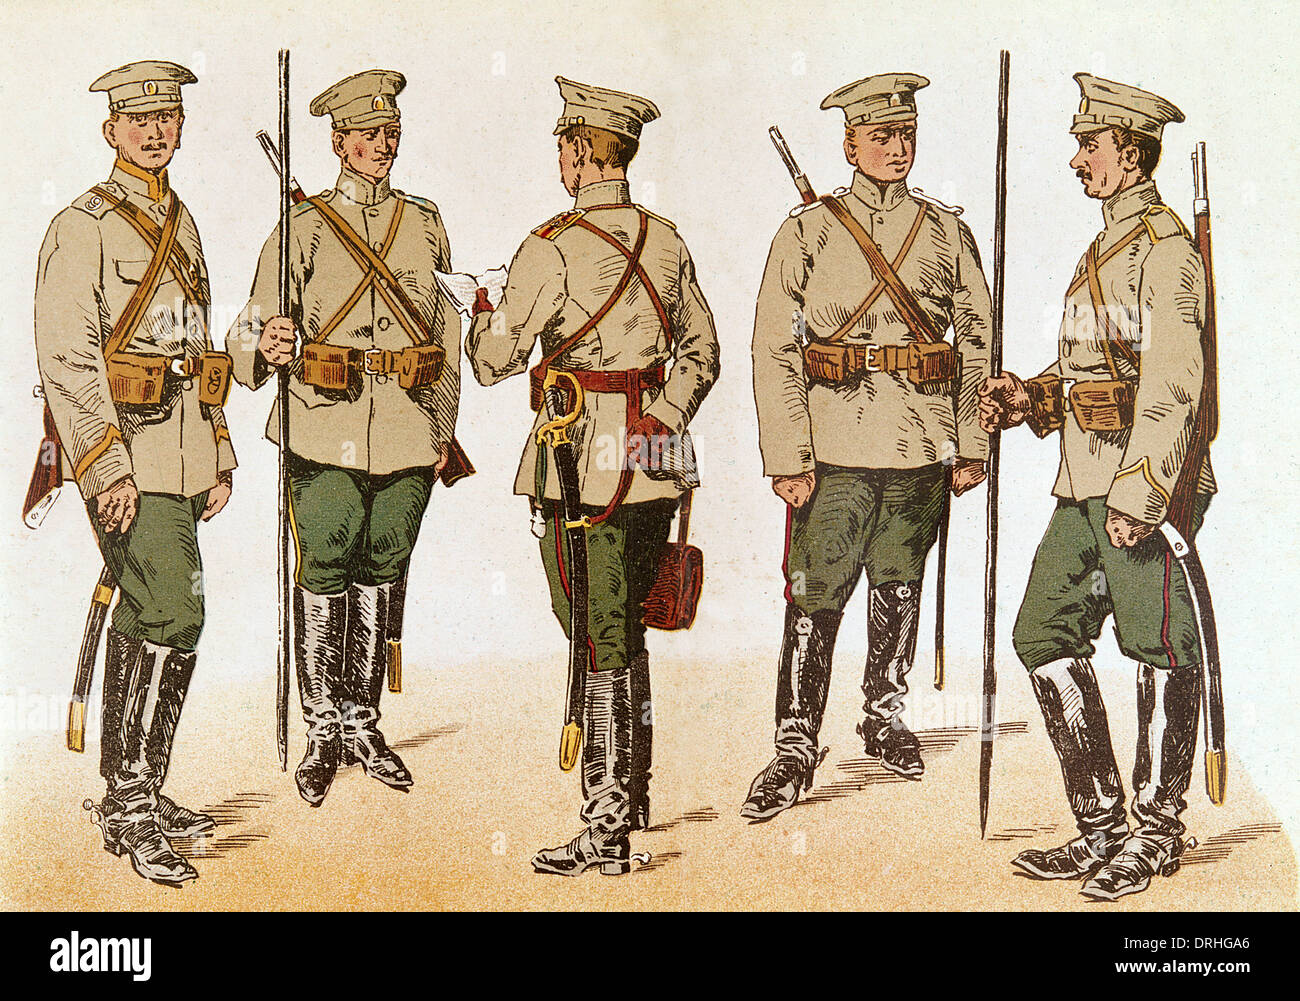 Russian cavalry uniforms, WW1 - Stock Image